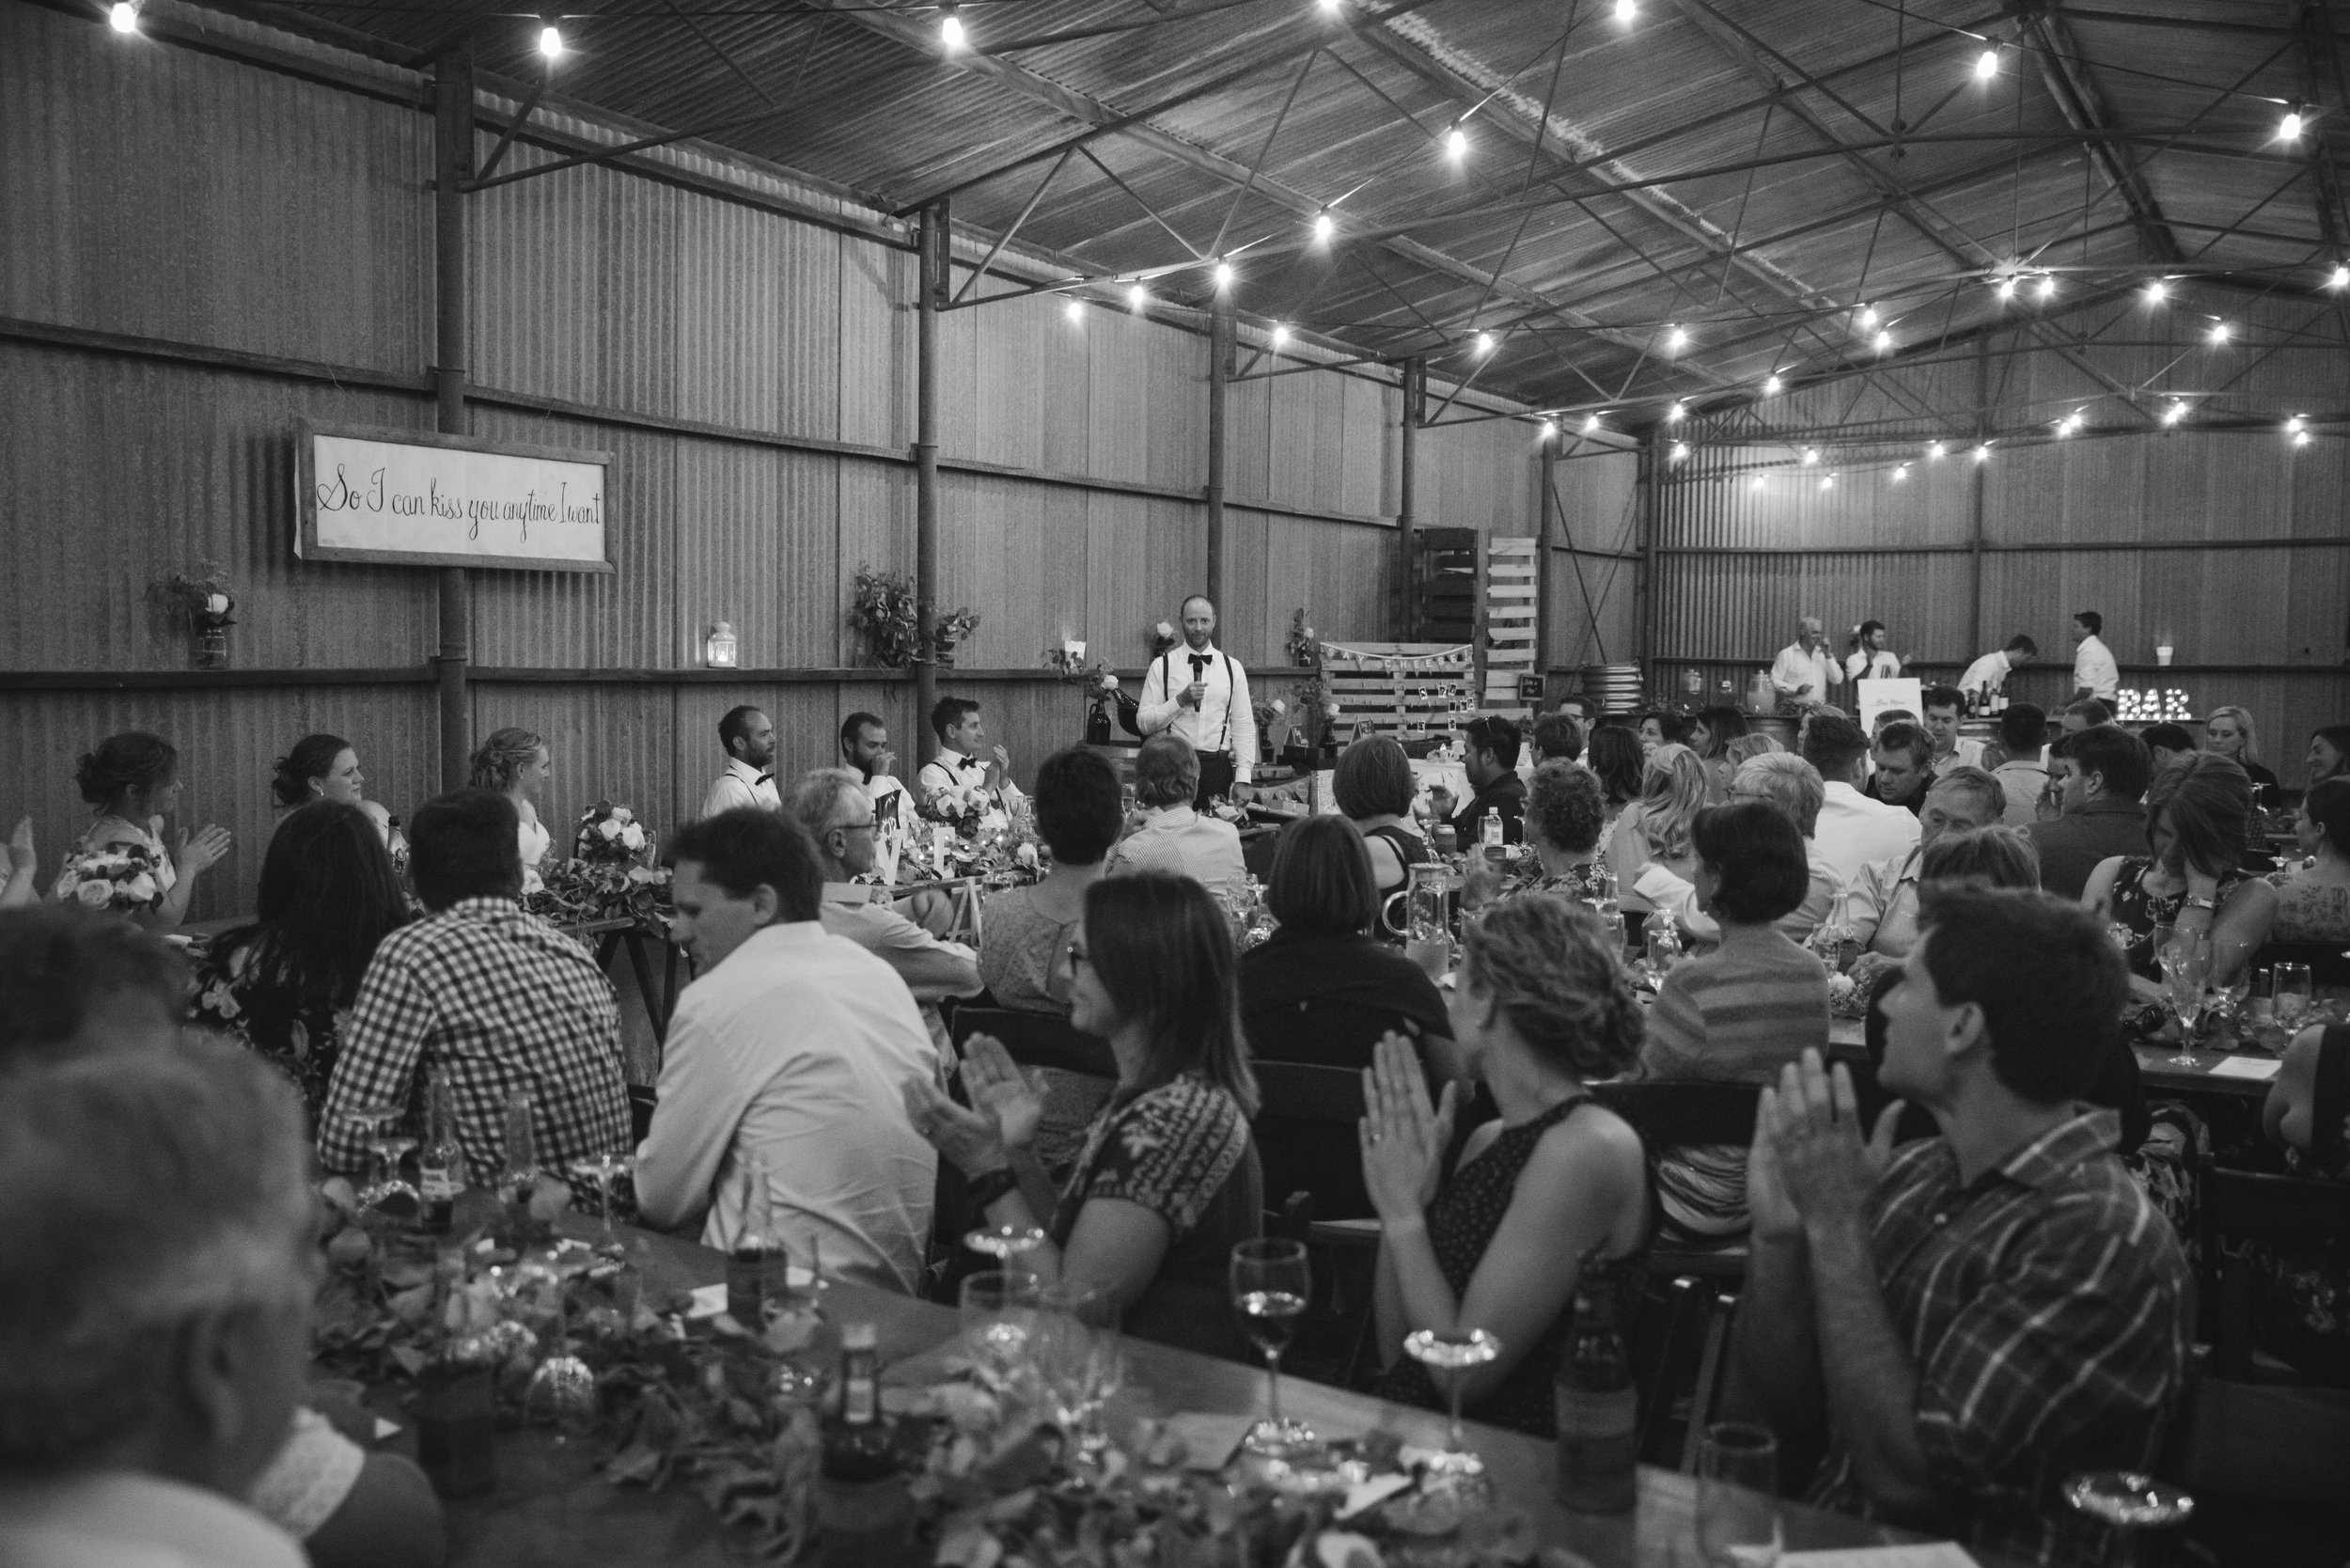 Wheatbelt Merredin Rustic Rural Farm Wedding (74).jpg